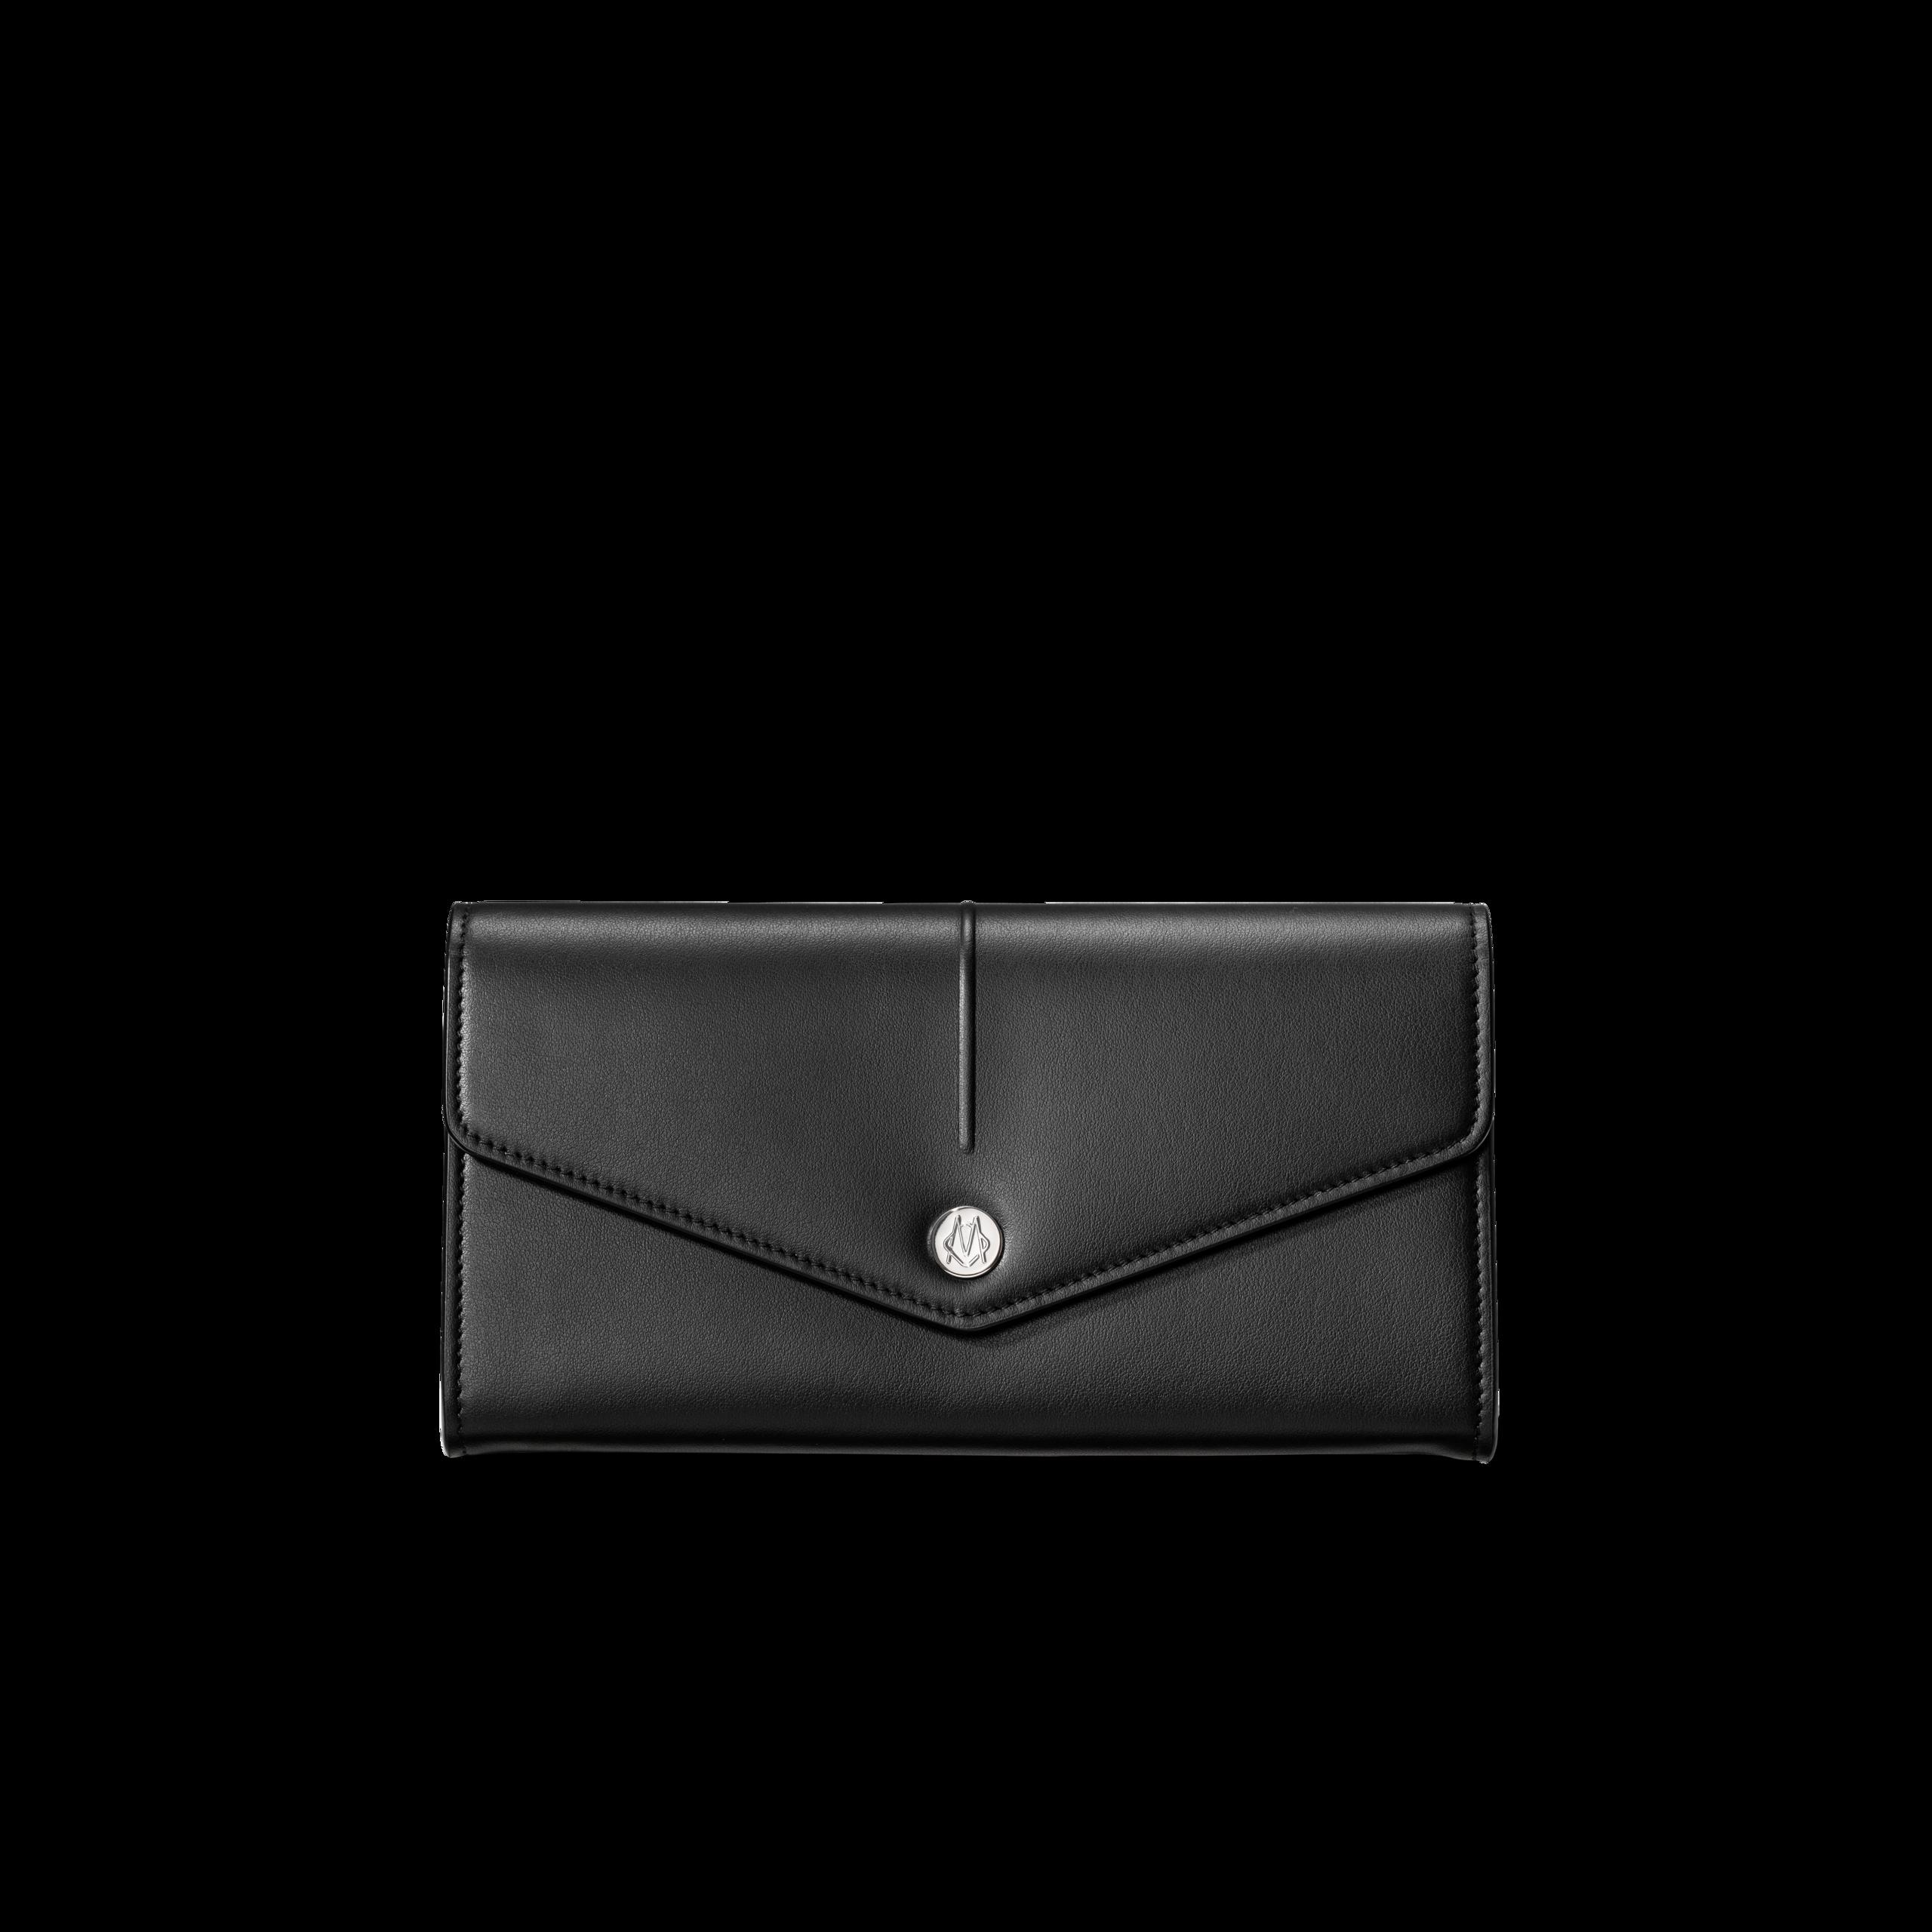 Couvert-Brieftasche